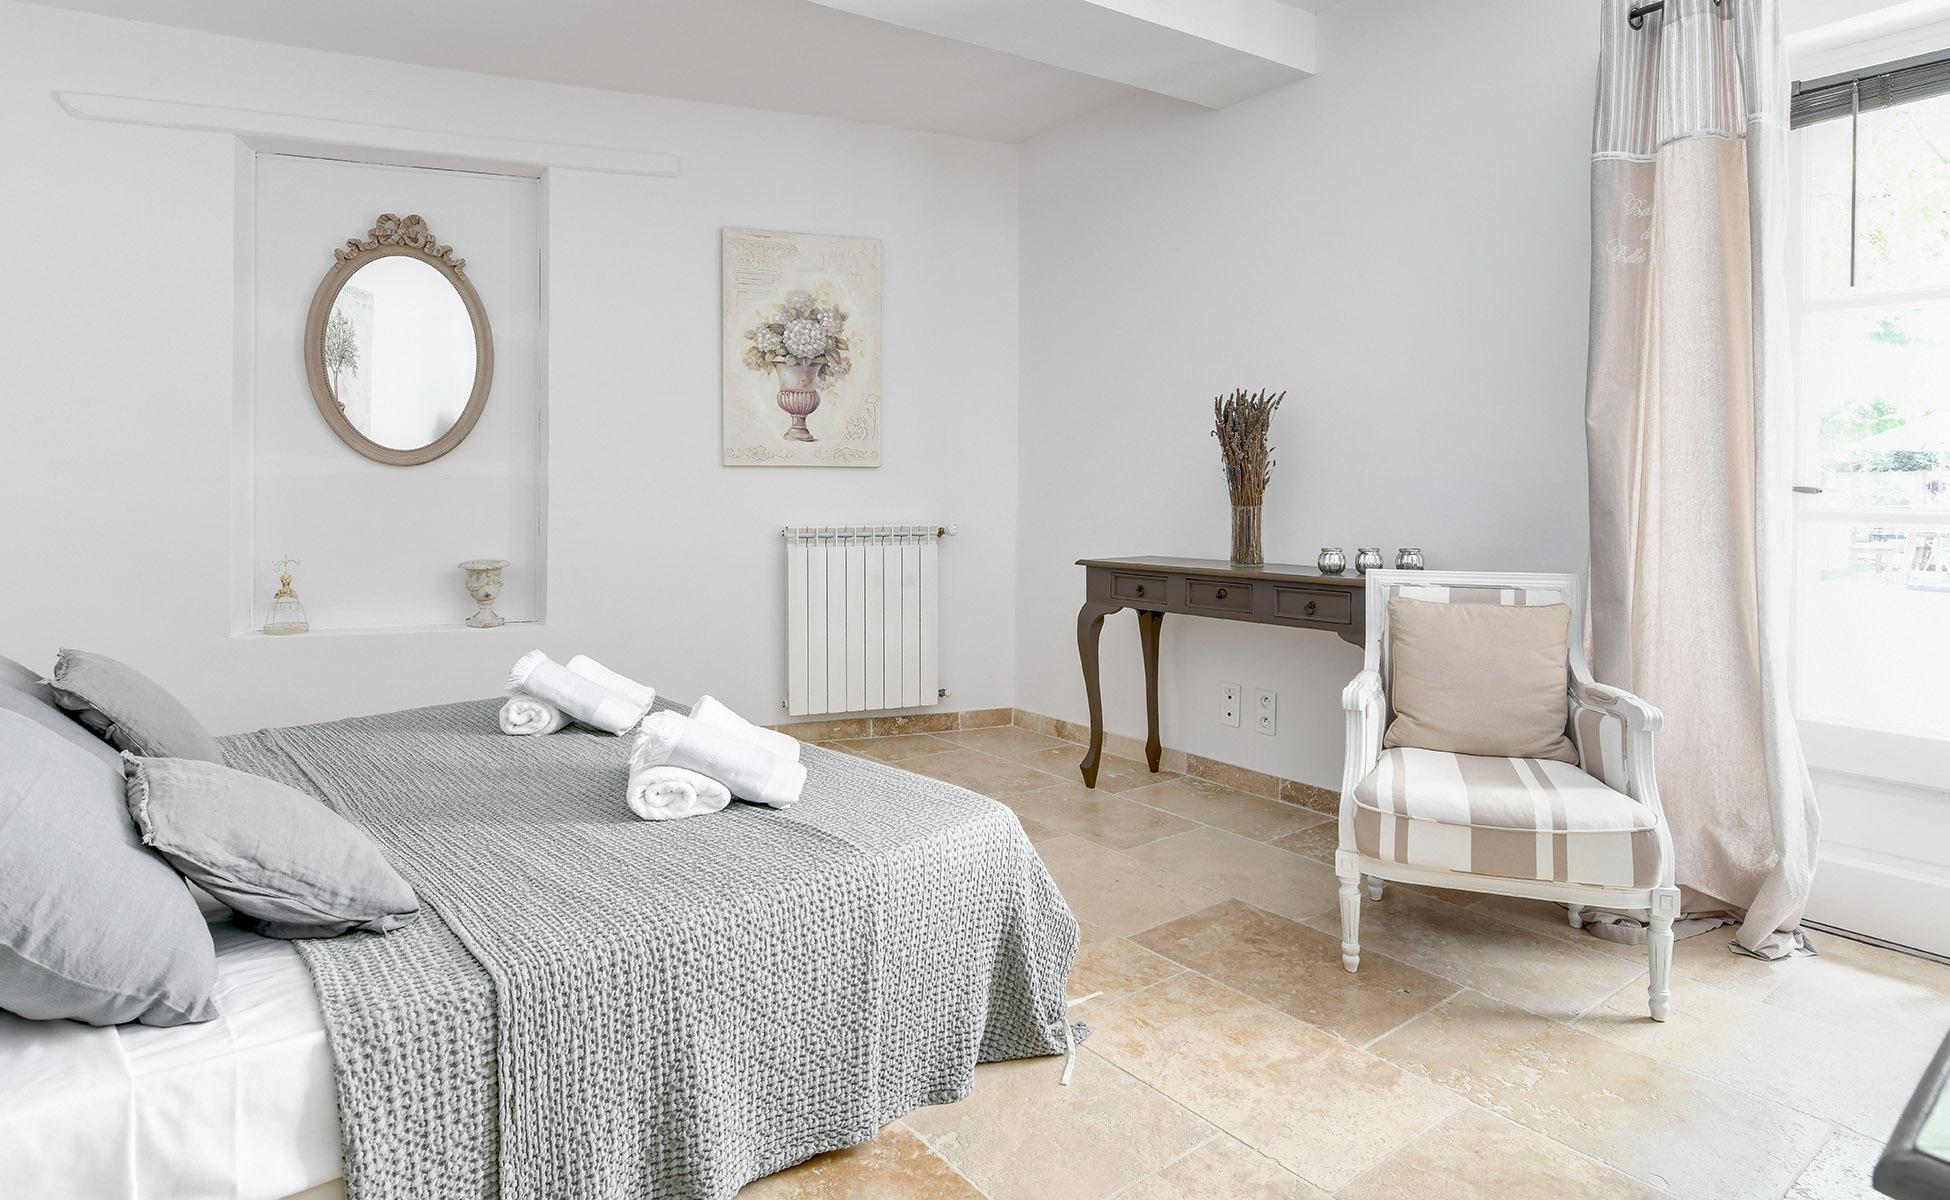 Lovelydays luxury service apartment rental - St Rémy de Provence and surroundings - Ameu Mas - Partner - 6 bedrooms - 6 bathrooms - Queen bed - aa97a3b84526 - Lovelydays